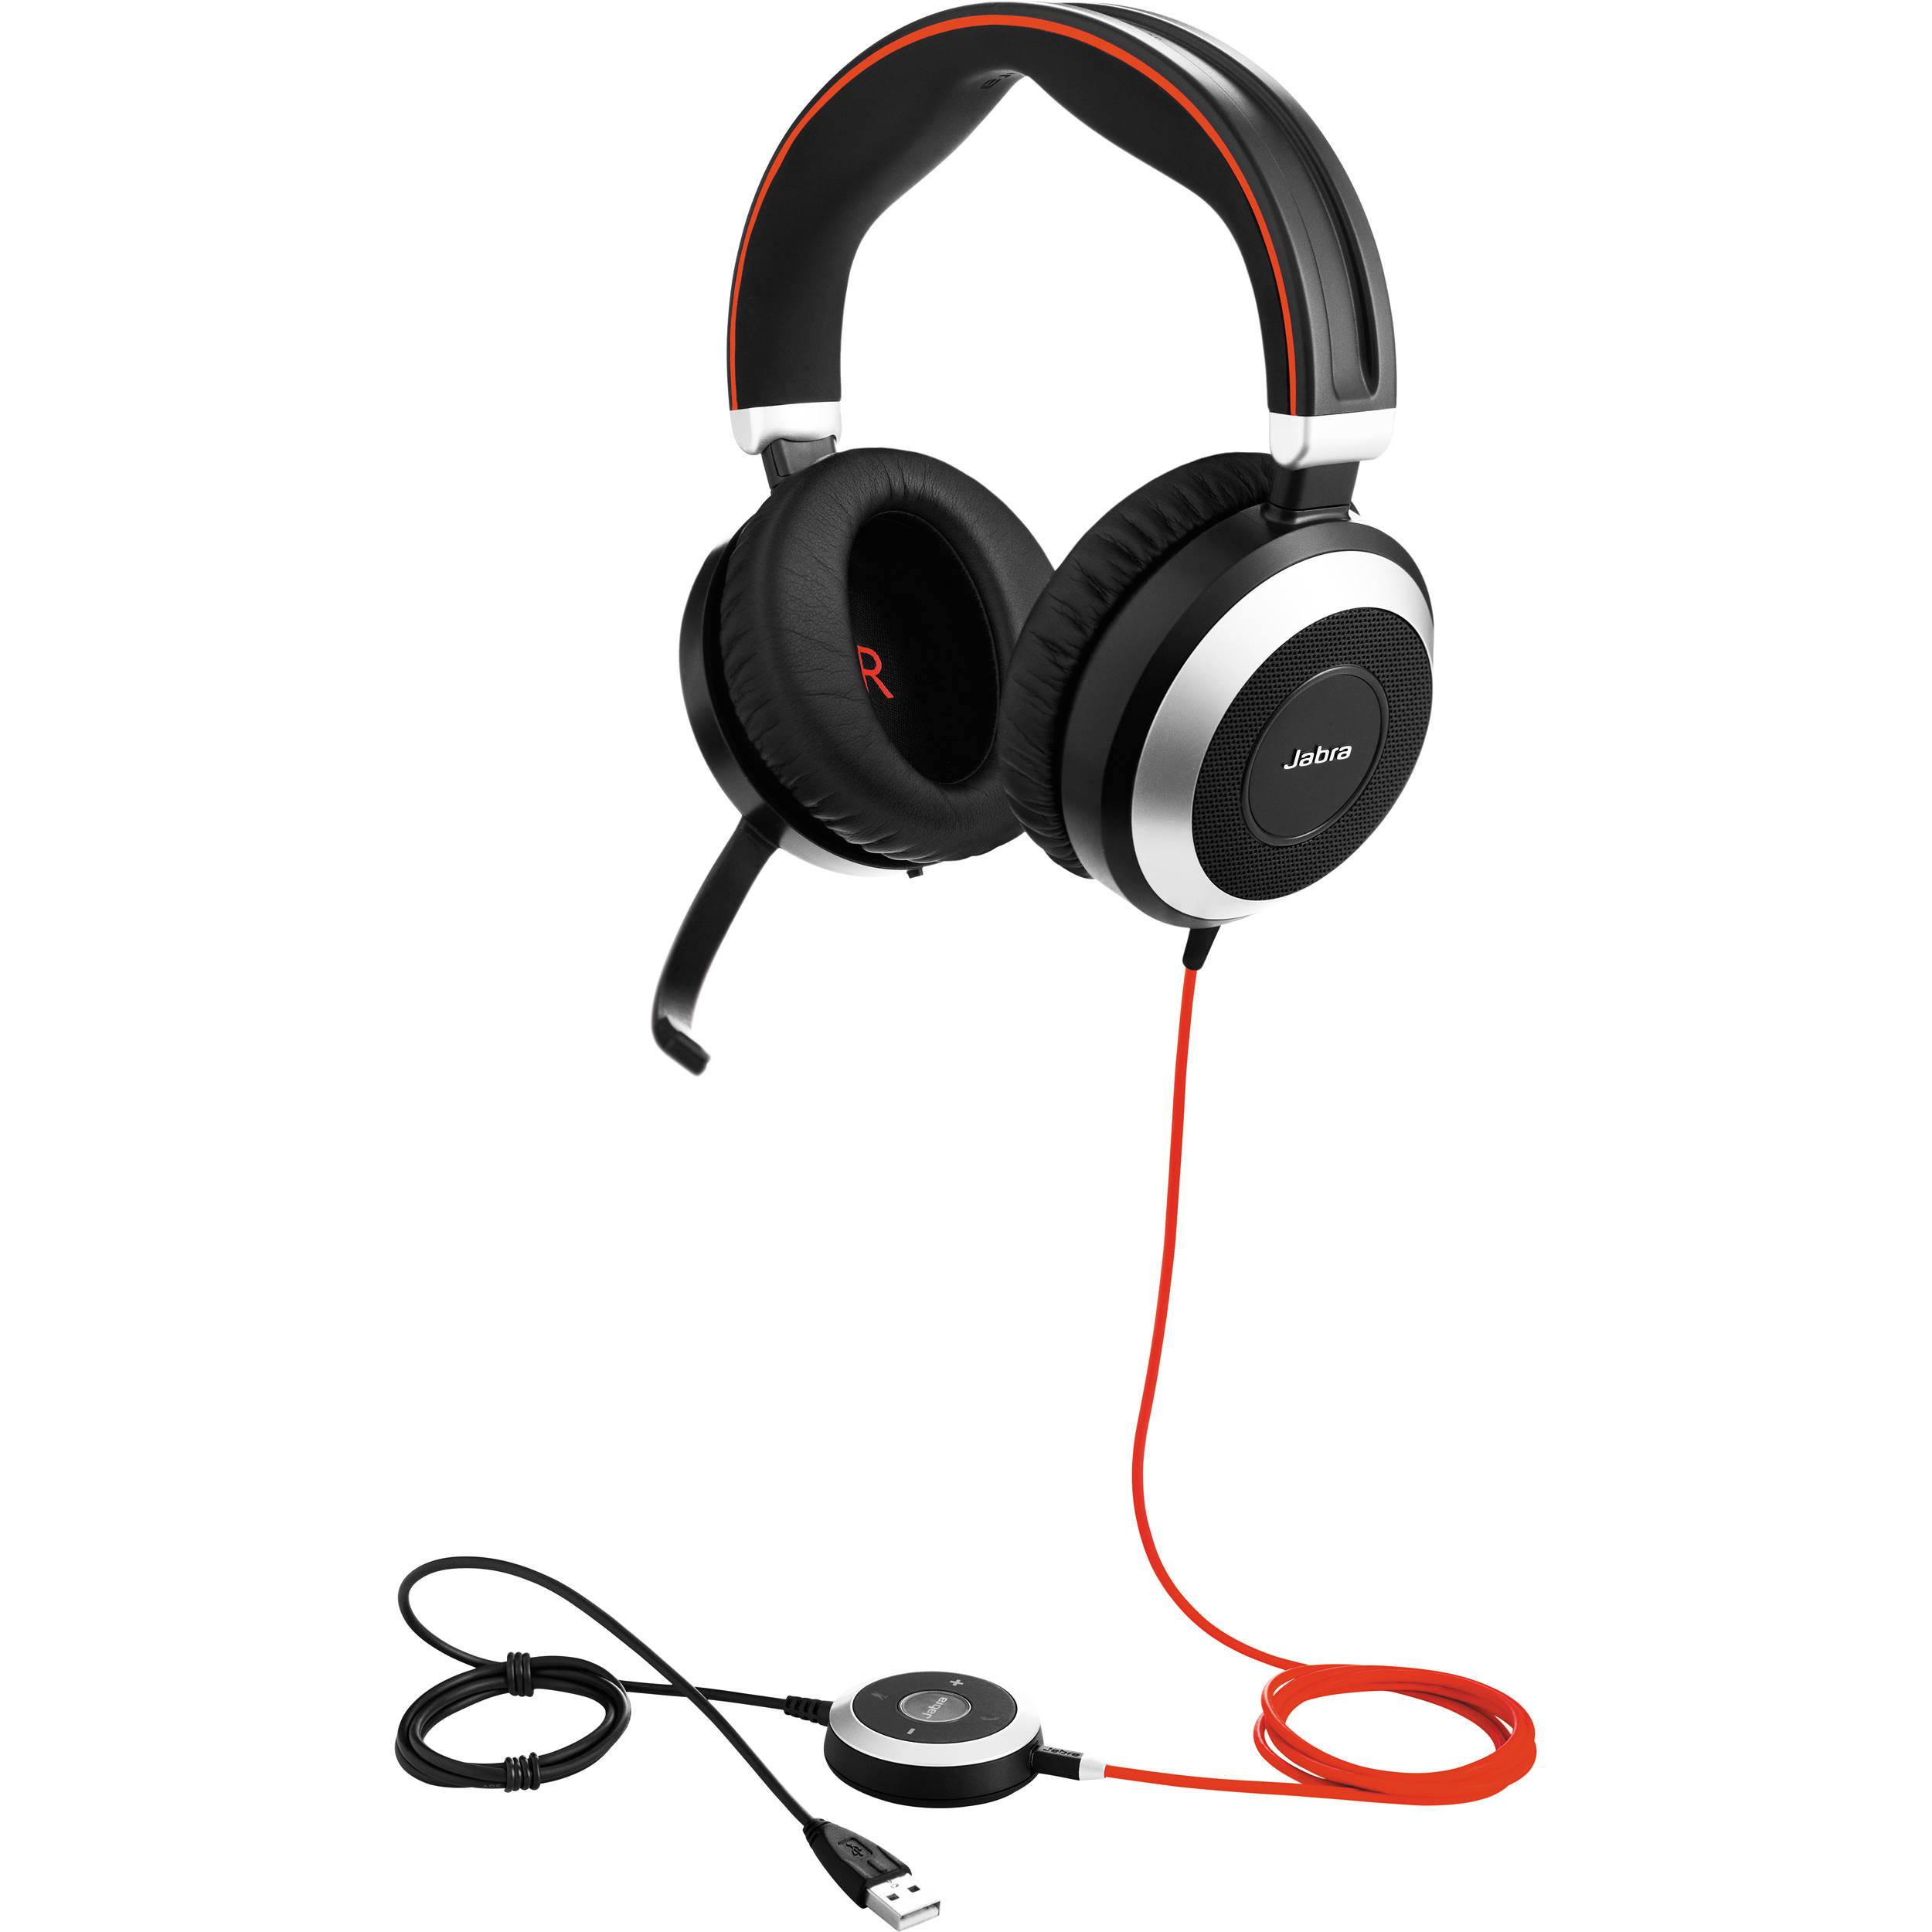 Jabra Evolve 75 Ms Stereo: Jabra EVOLVE 80 MS Stereo Headset 7899-823-109 B&H Photo Video